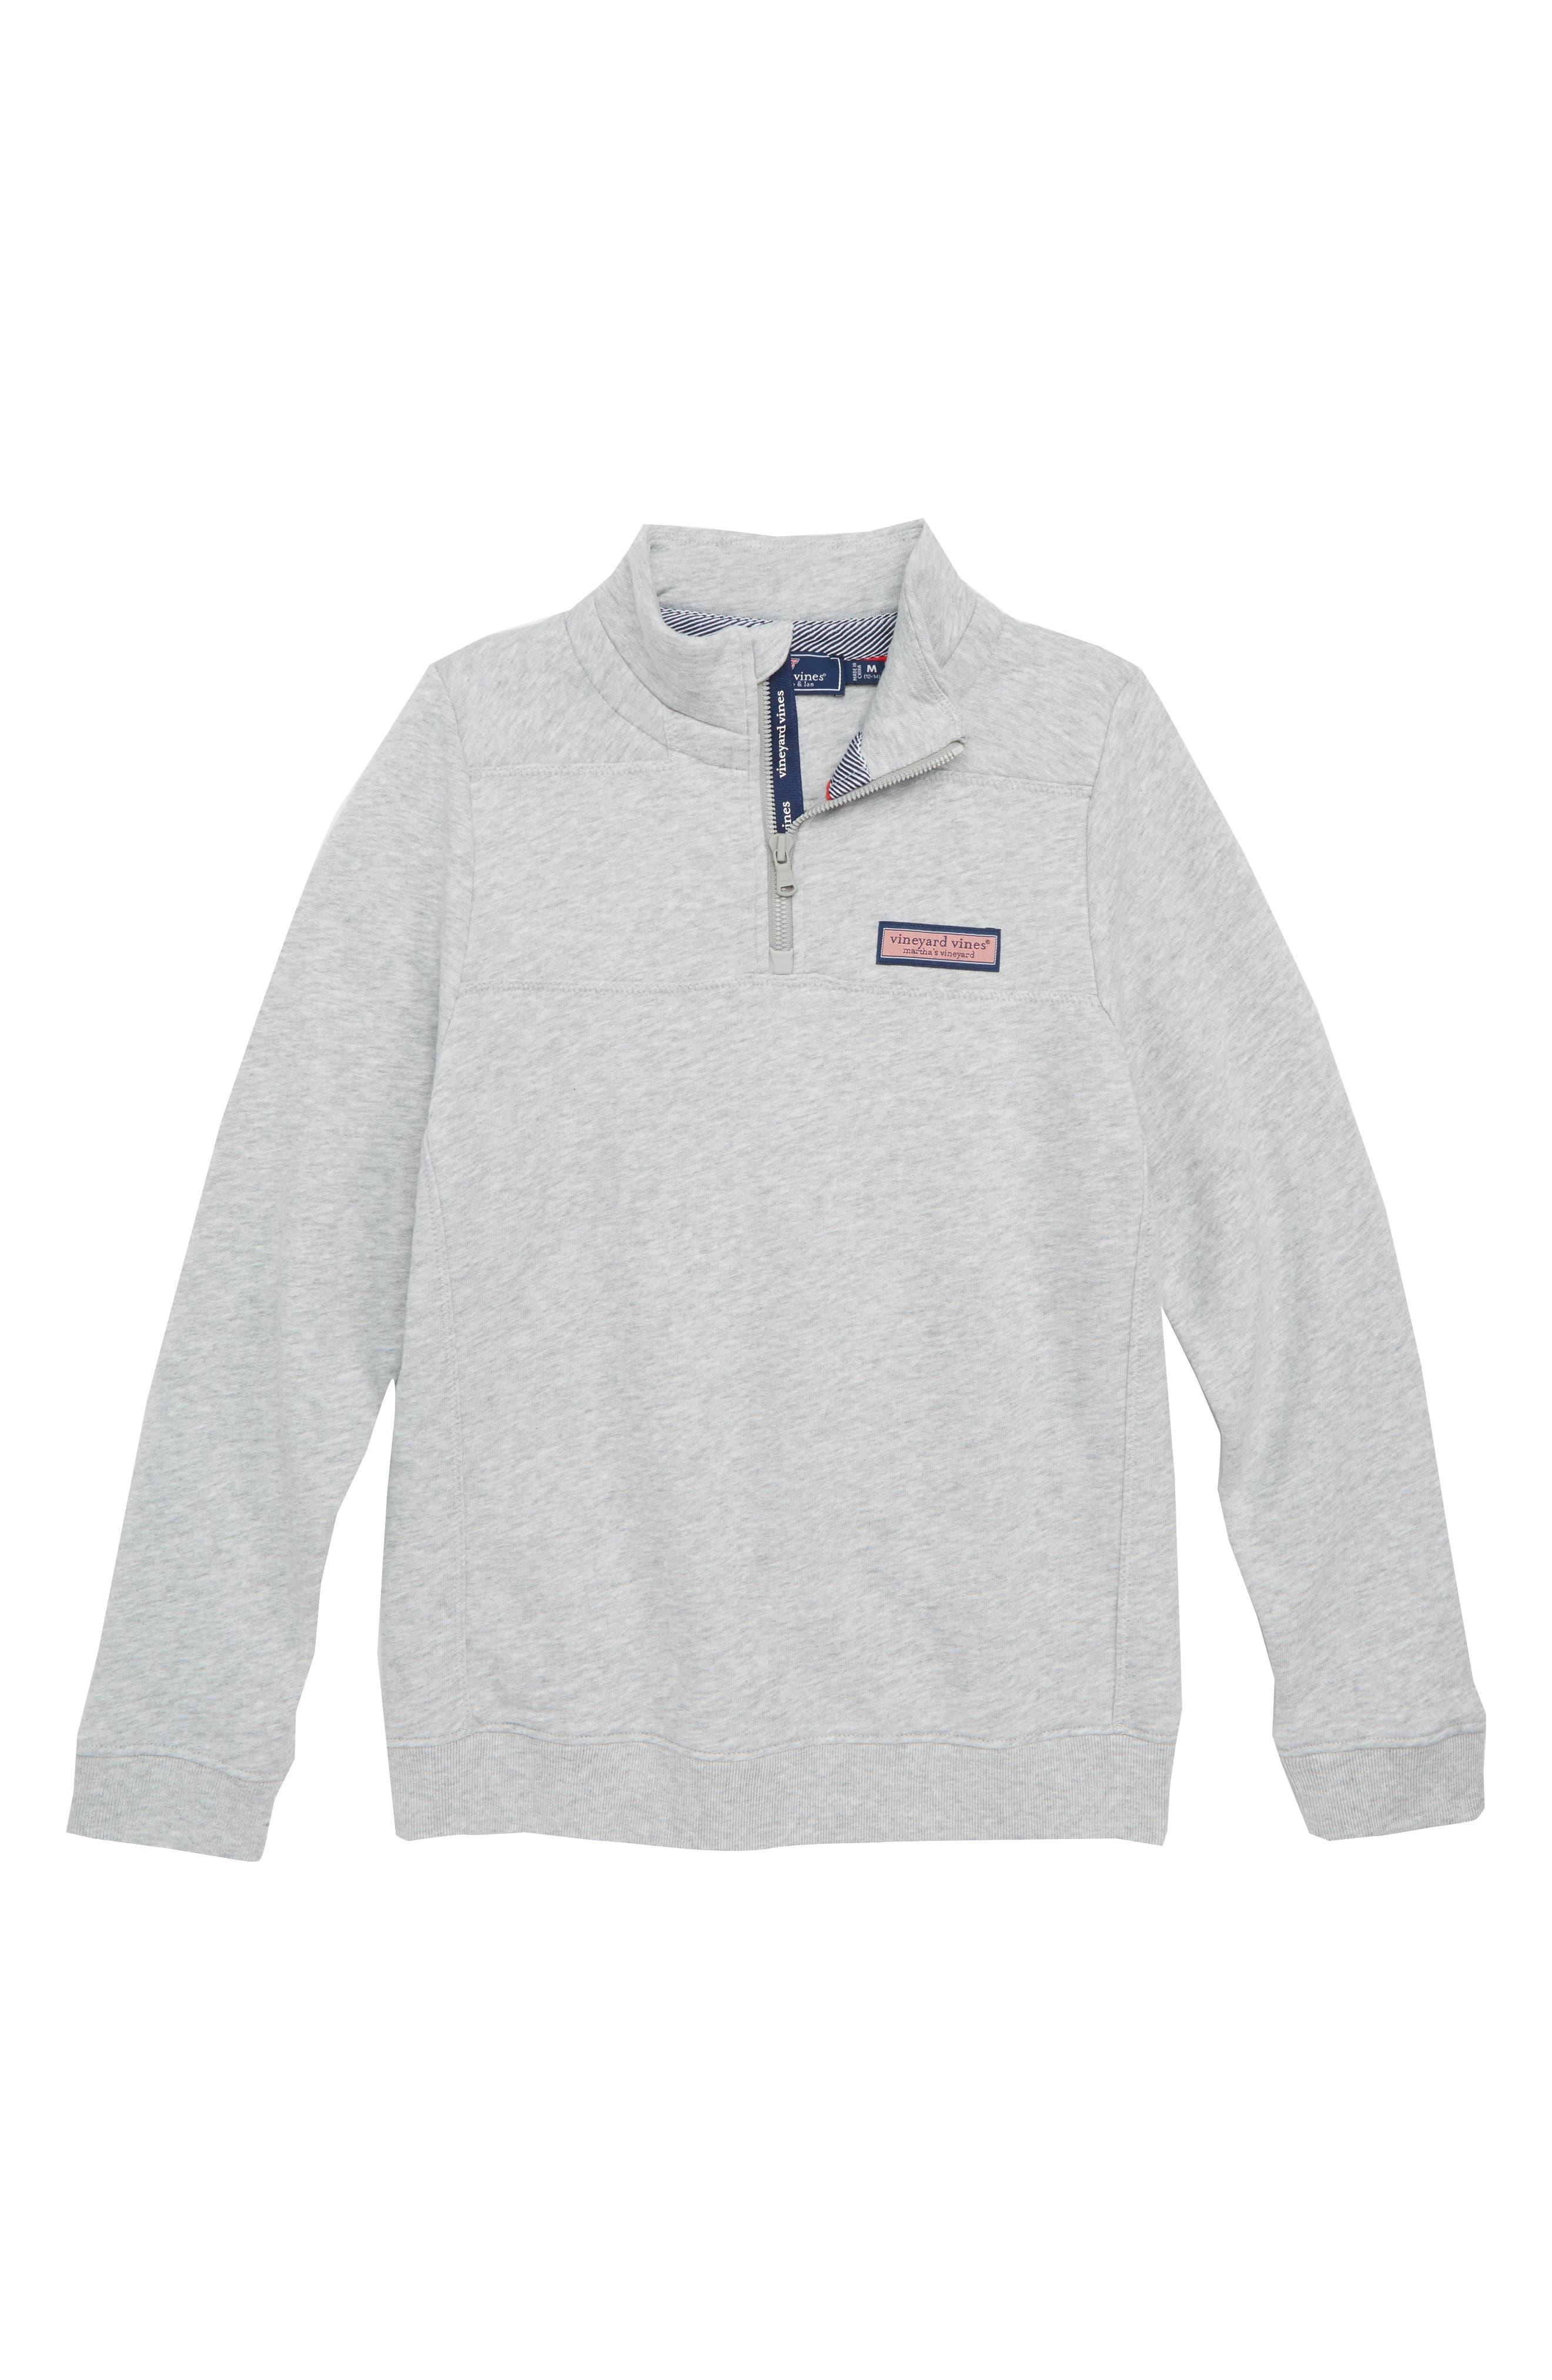 Sail Stitch Shep Quarter Zip Pullover,                         Main,                         color,